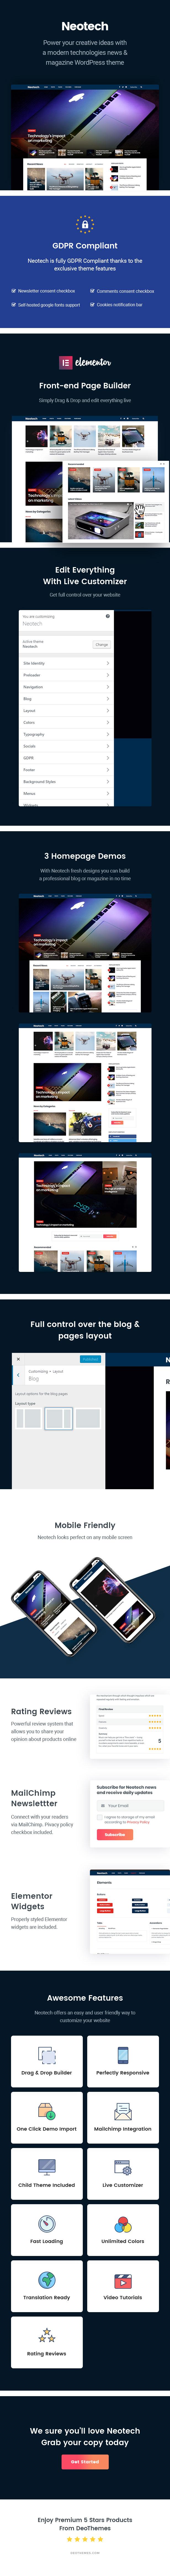 Neotech   Magazin Elementor WordPress Theme